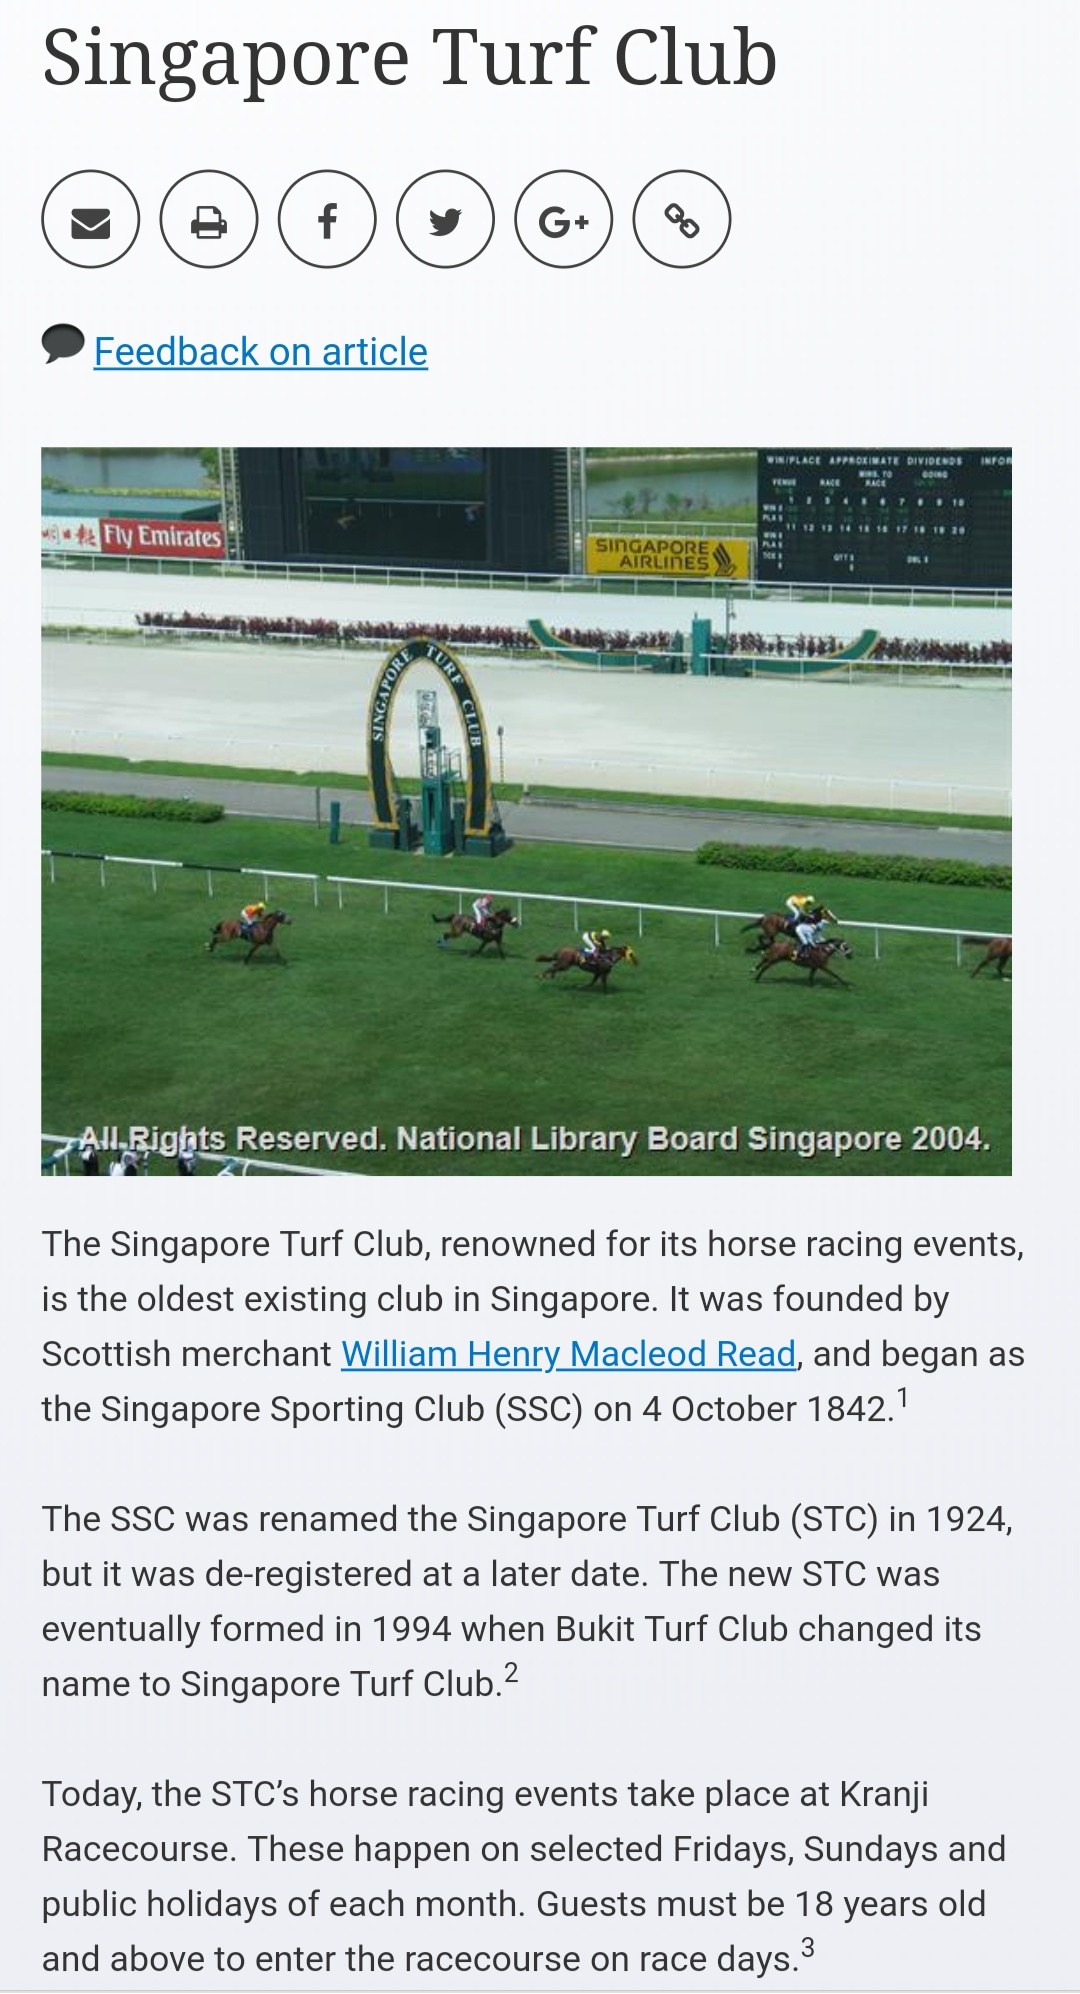 Serious - Singapore Turf Club's S$500 million ('96- Aug